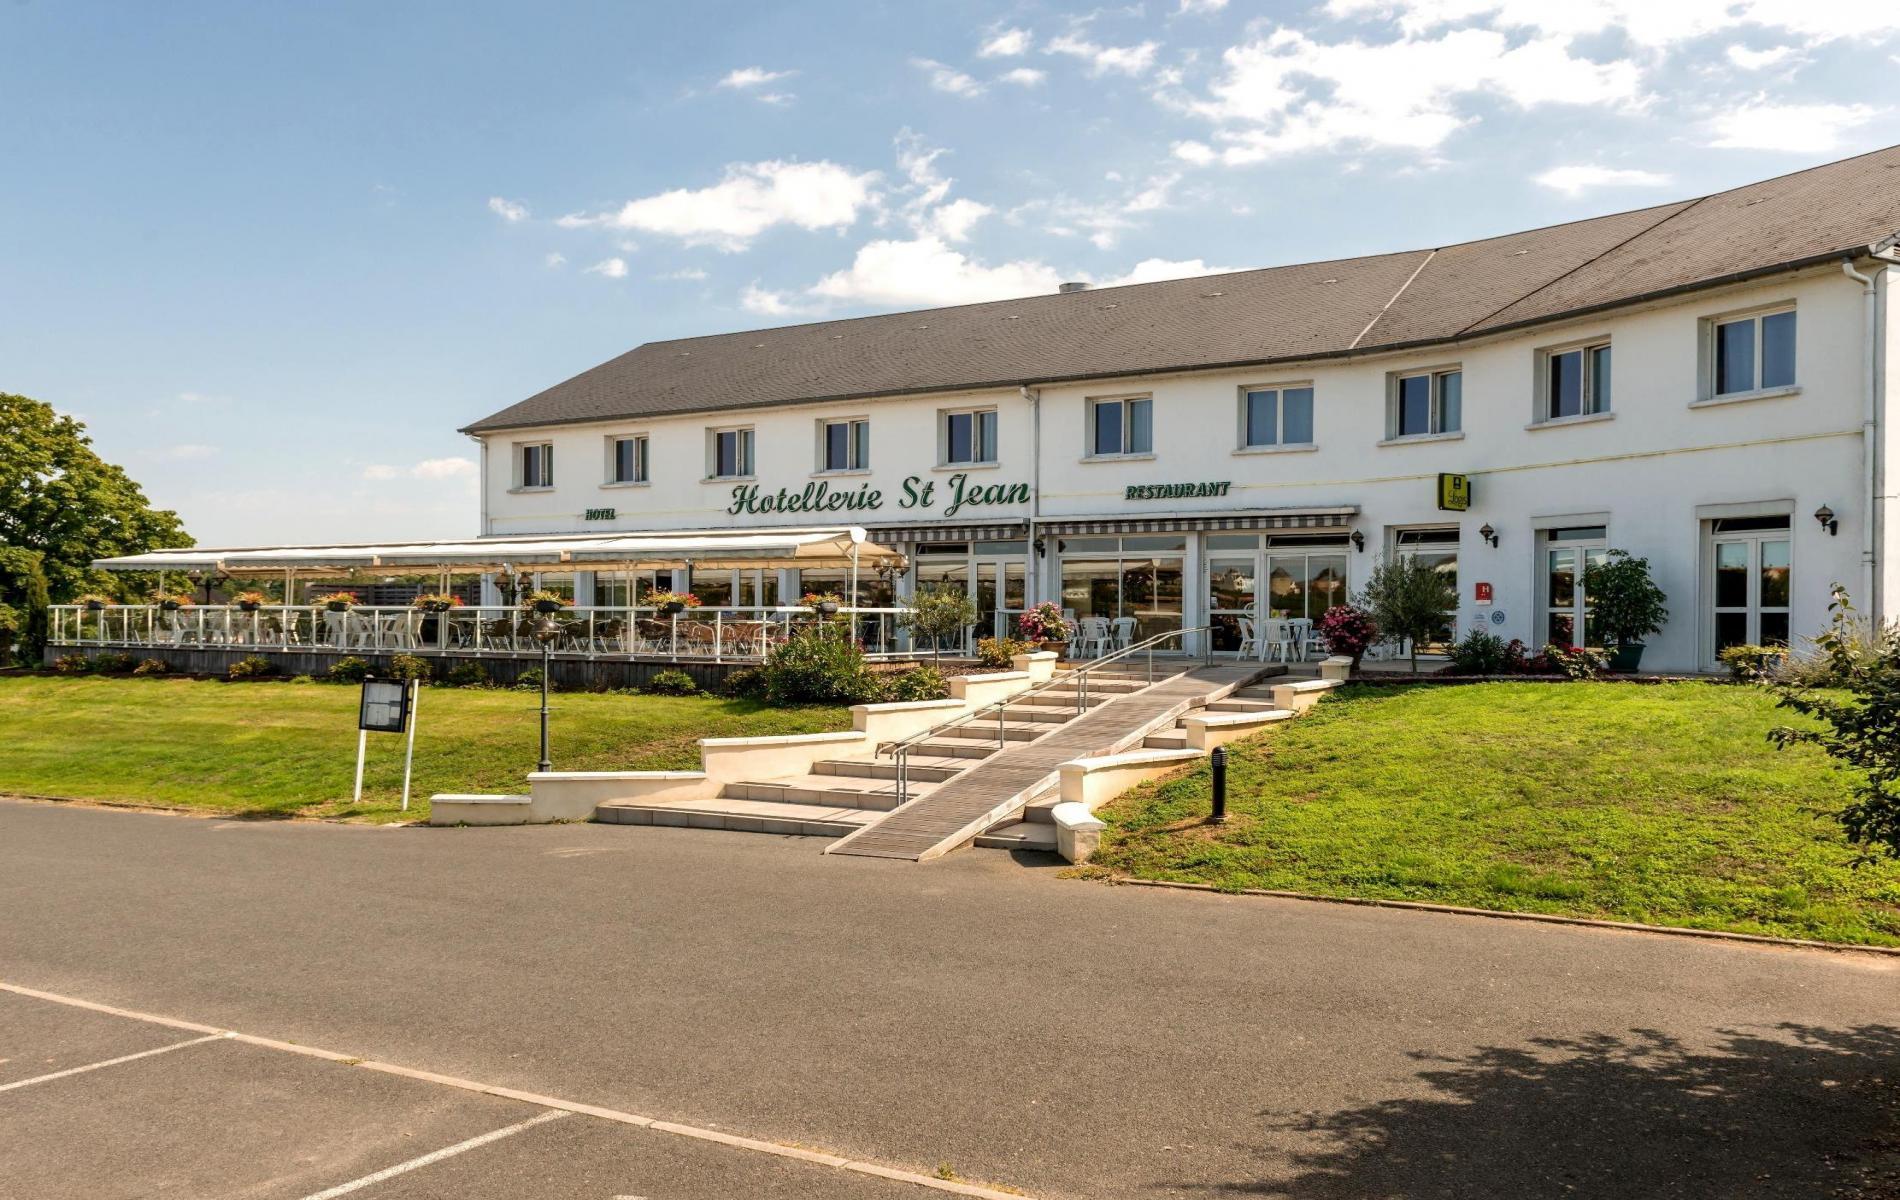 Hotellerie Saint Jean proche de Thouars